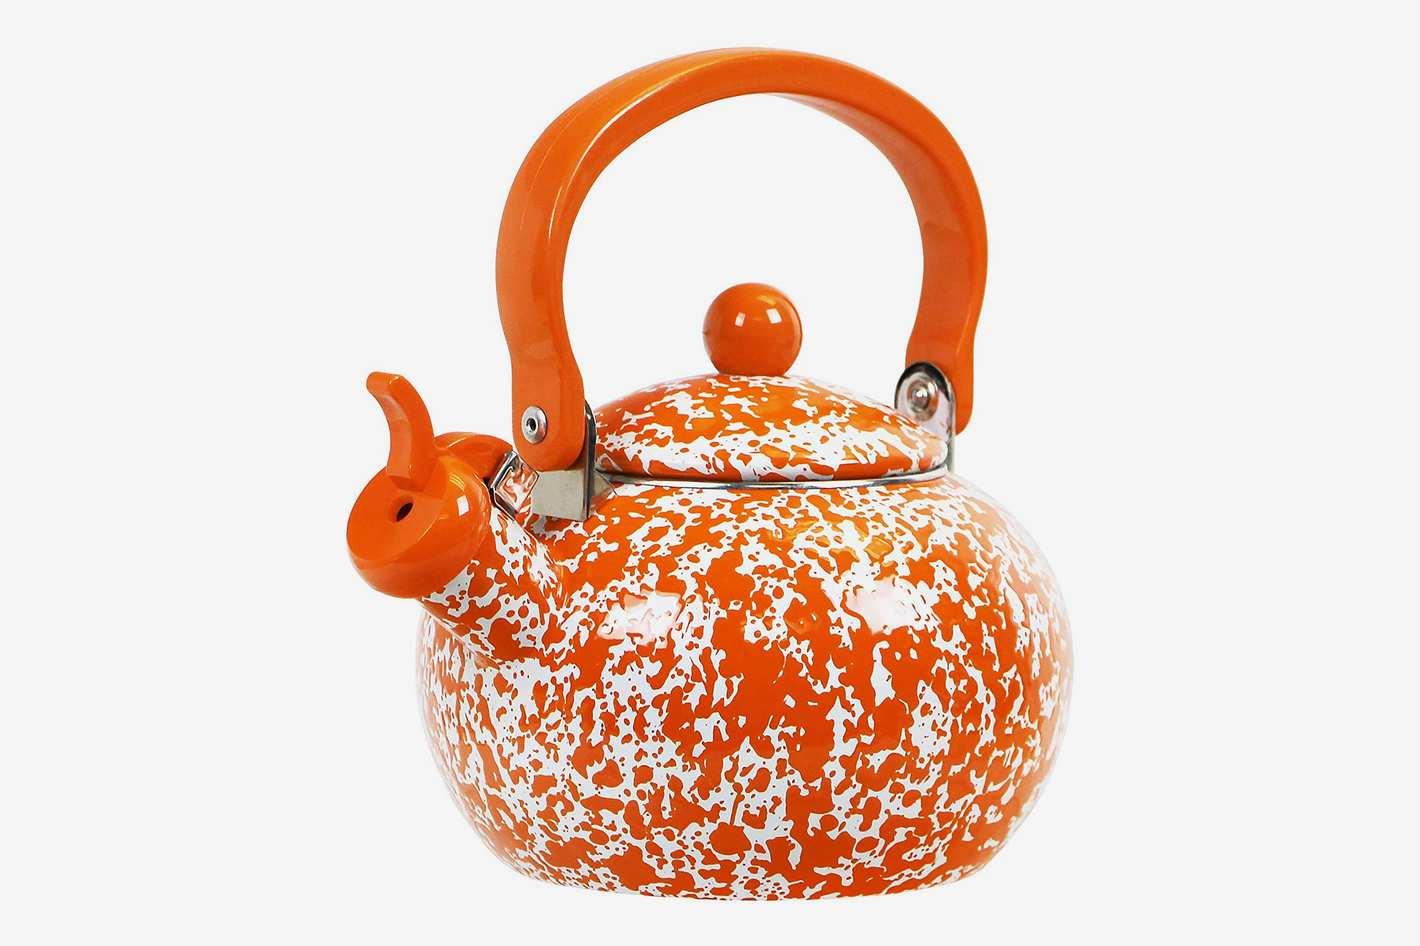 Calypso Basics by Reston Lloyd Whistling Teakettle, 2-Quart, Orange Marble